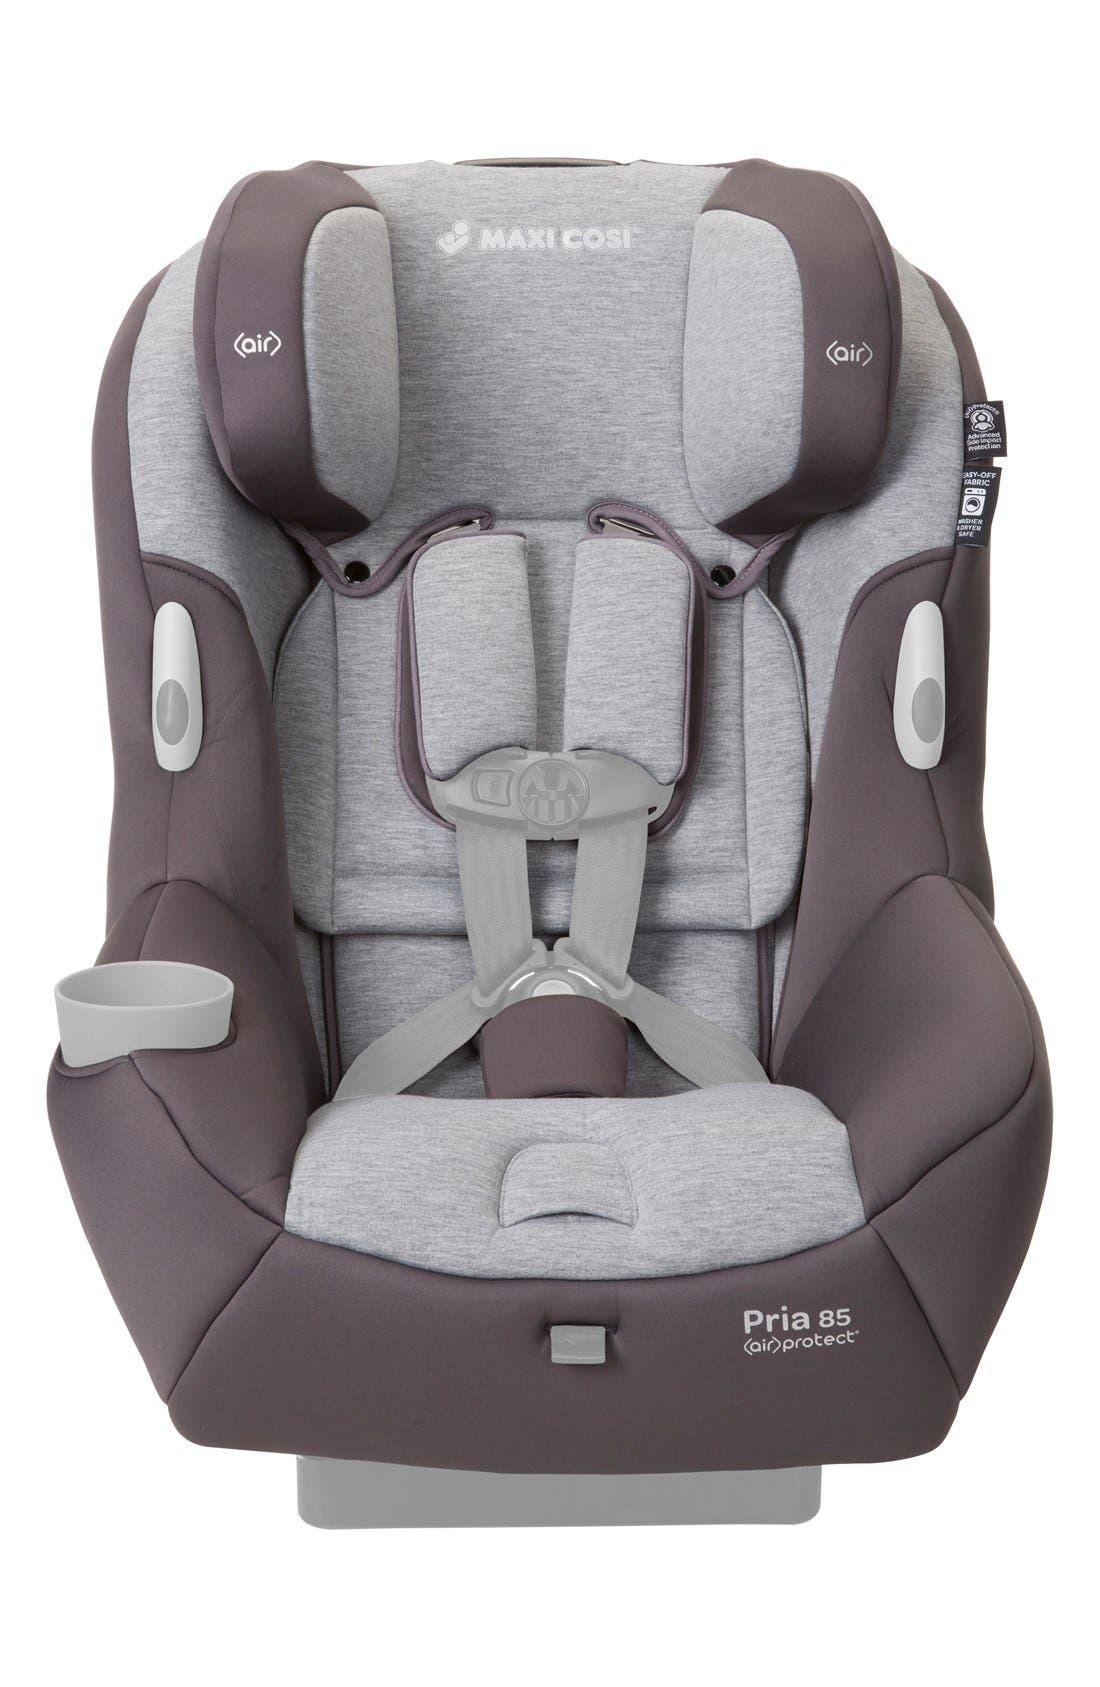 Maxi Cosi 174 Seat Pad Fashion Kit For Pria 85 Car Seat